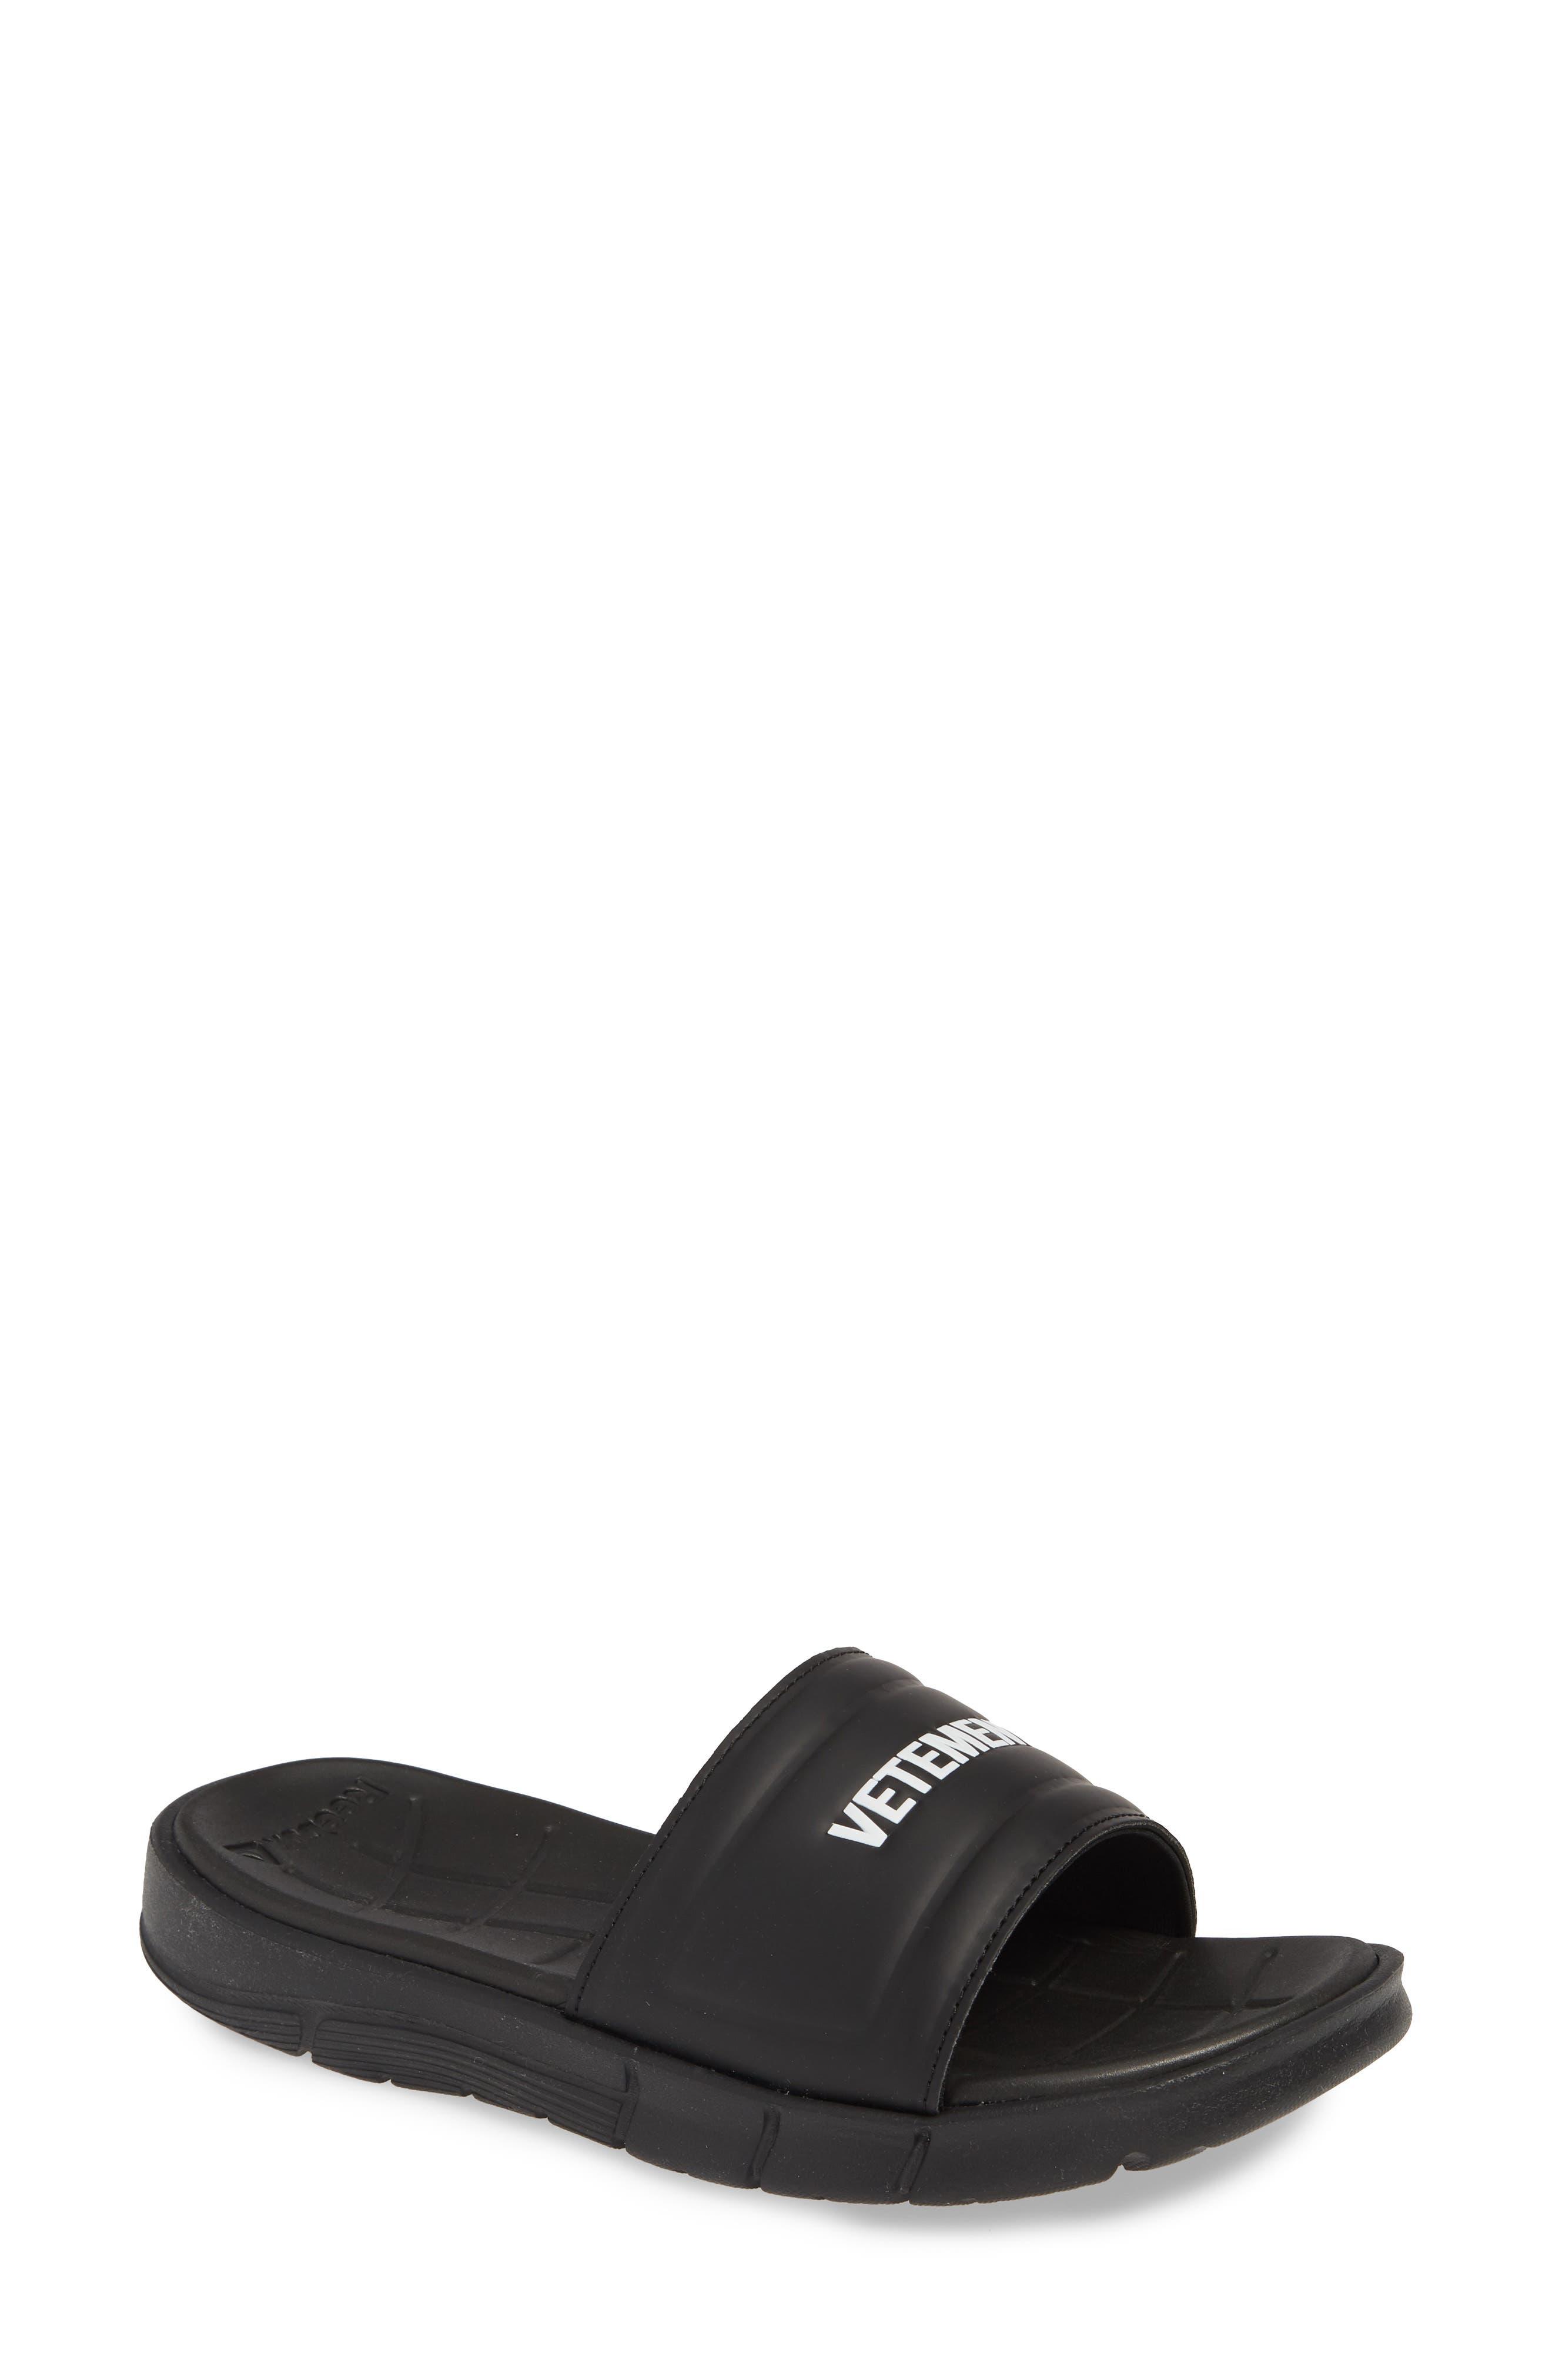 VETEMENTS x Reebok Logo Slide Sandal, Main, color, BLACK/ WHITE